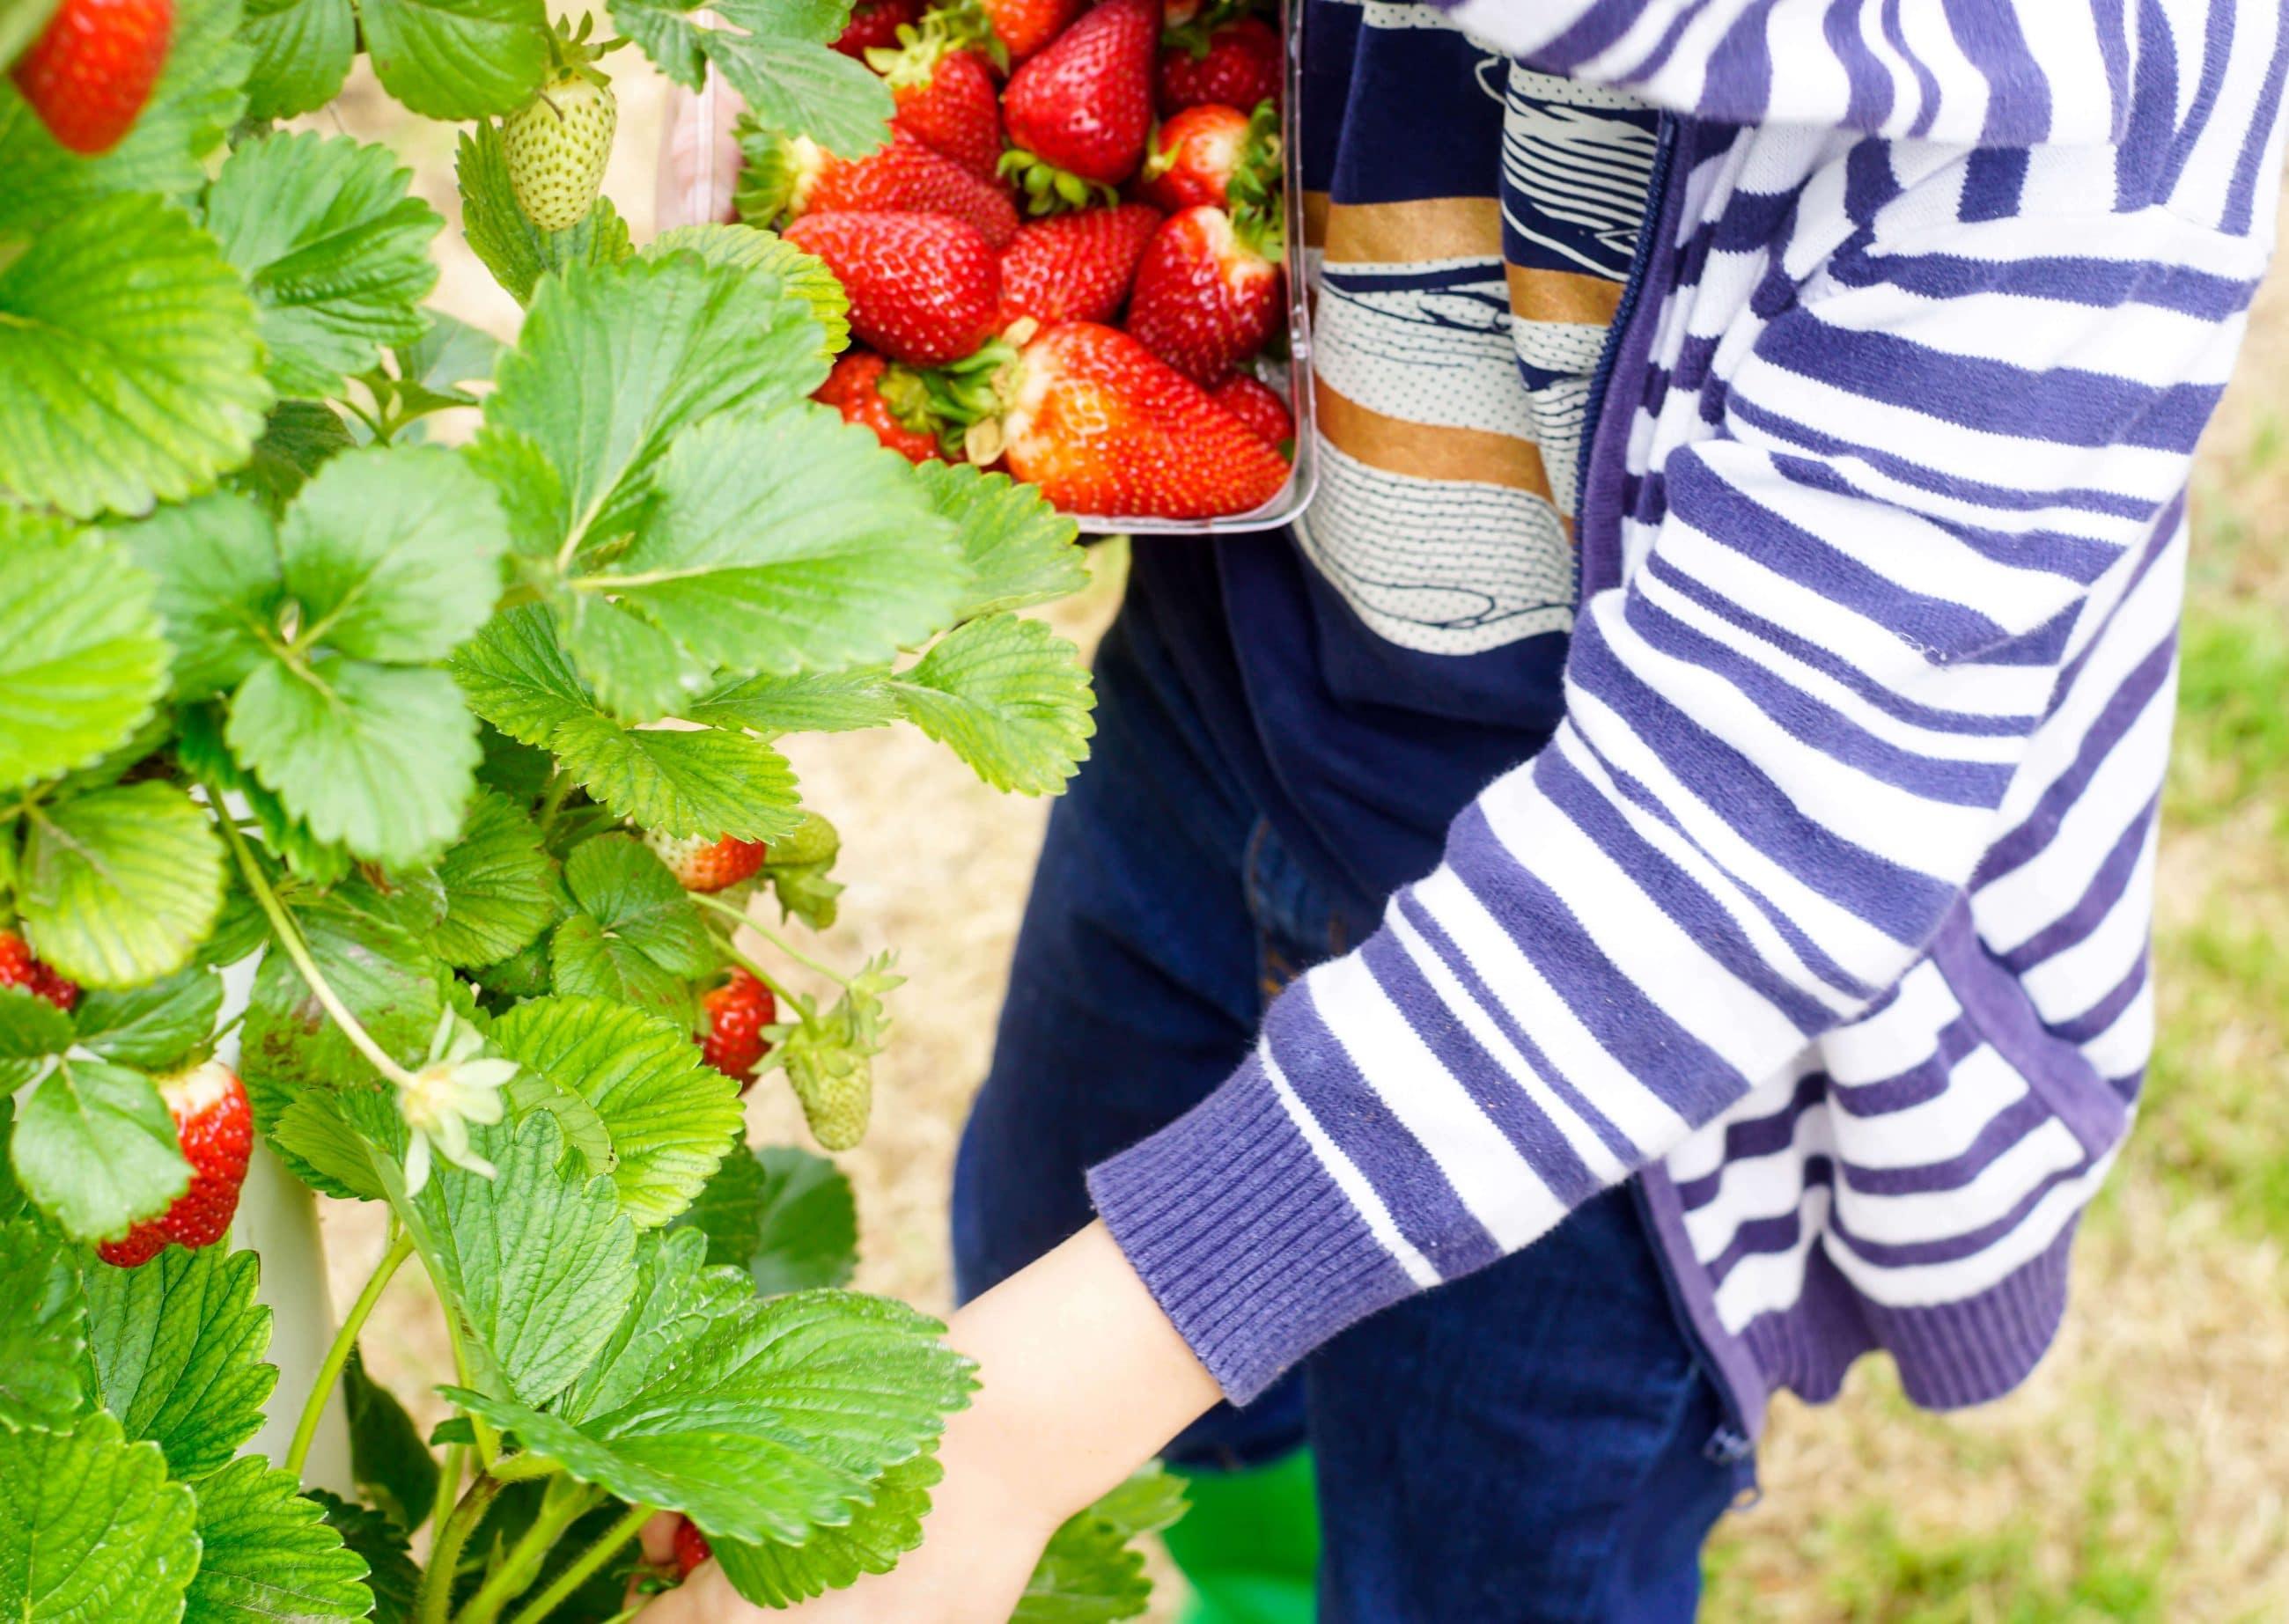 dedbfe3f7e0 The Strawberry Forest